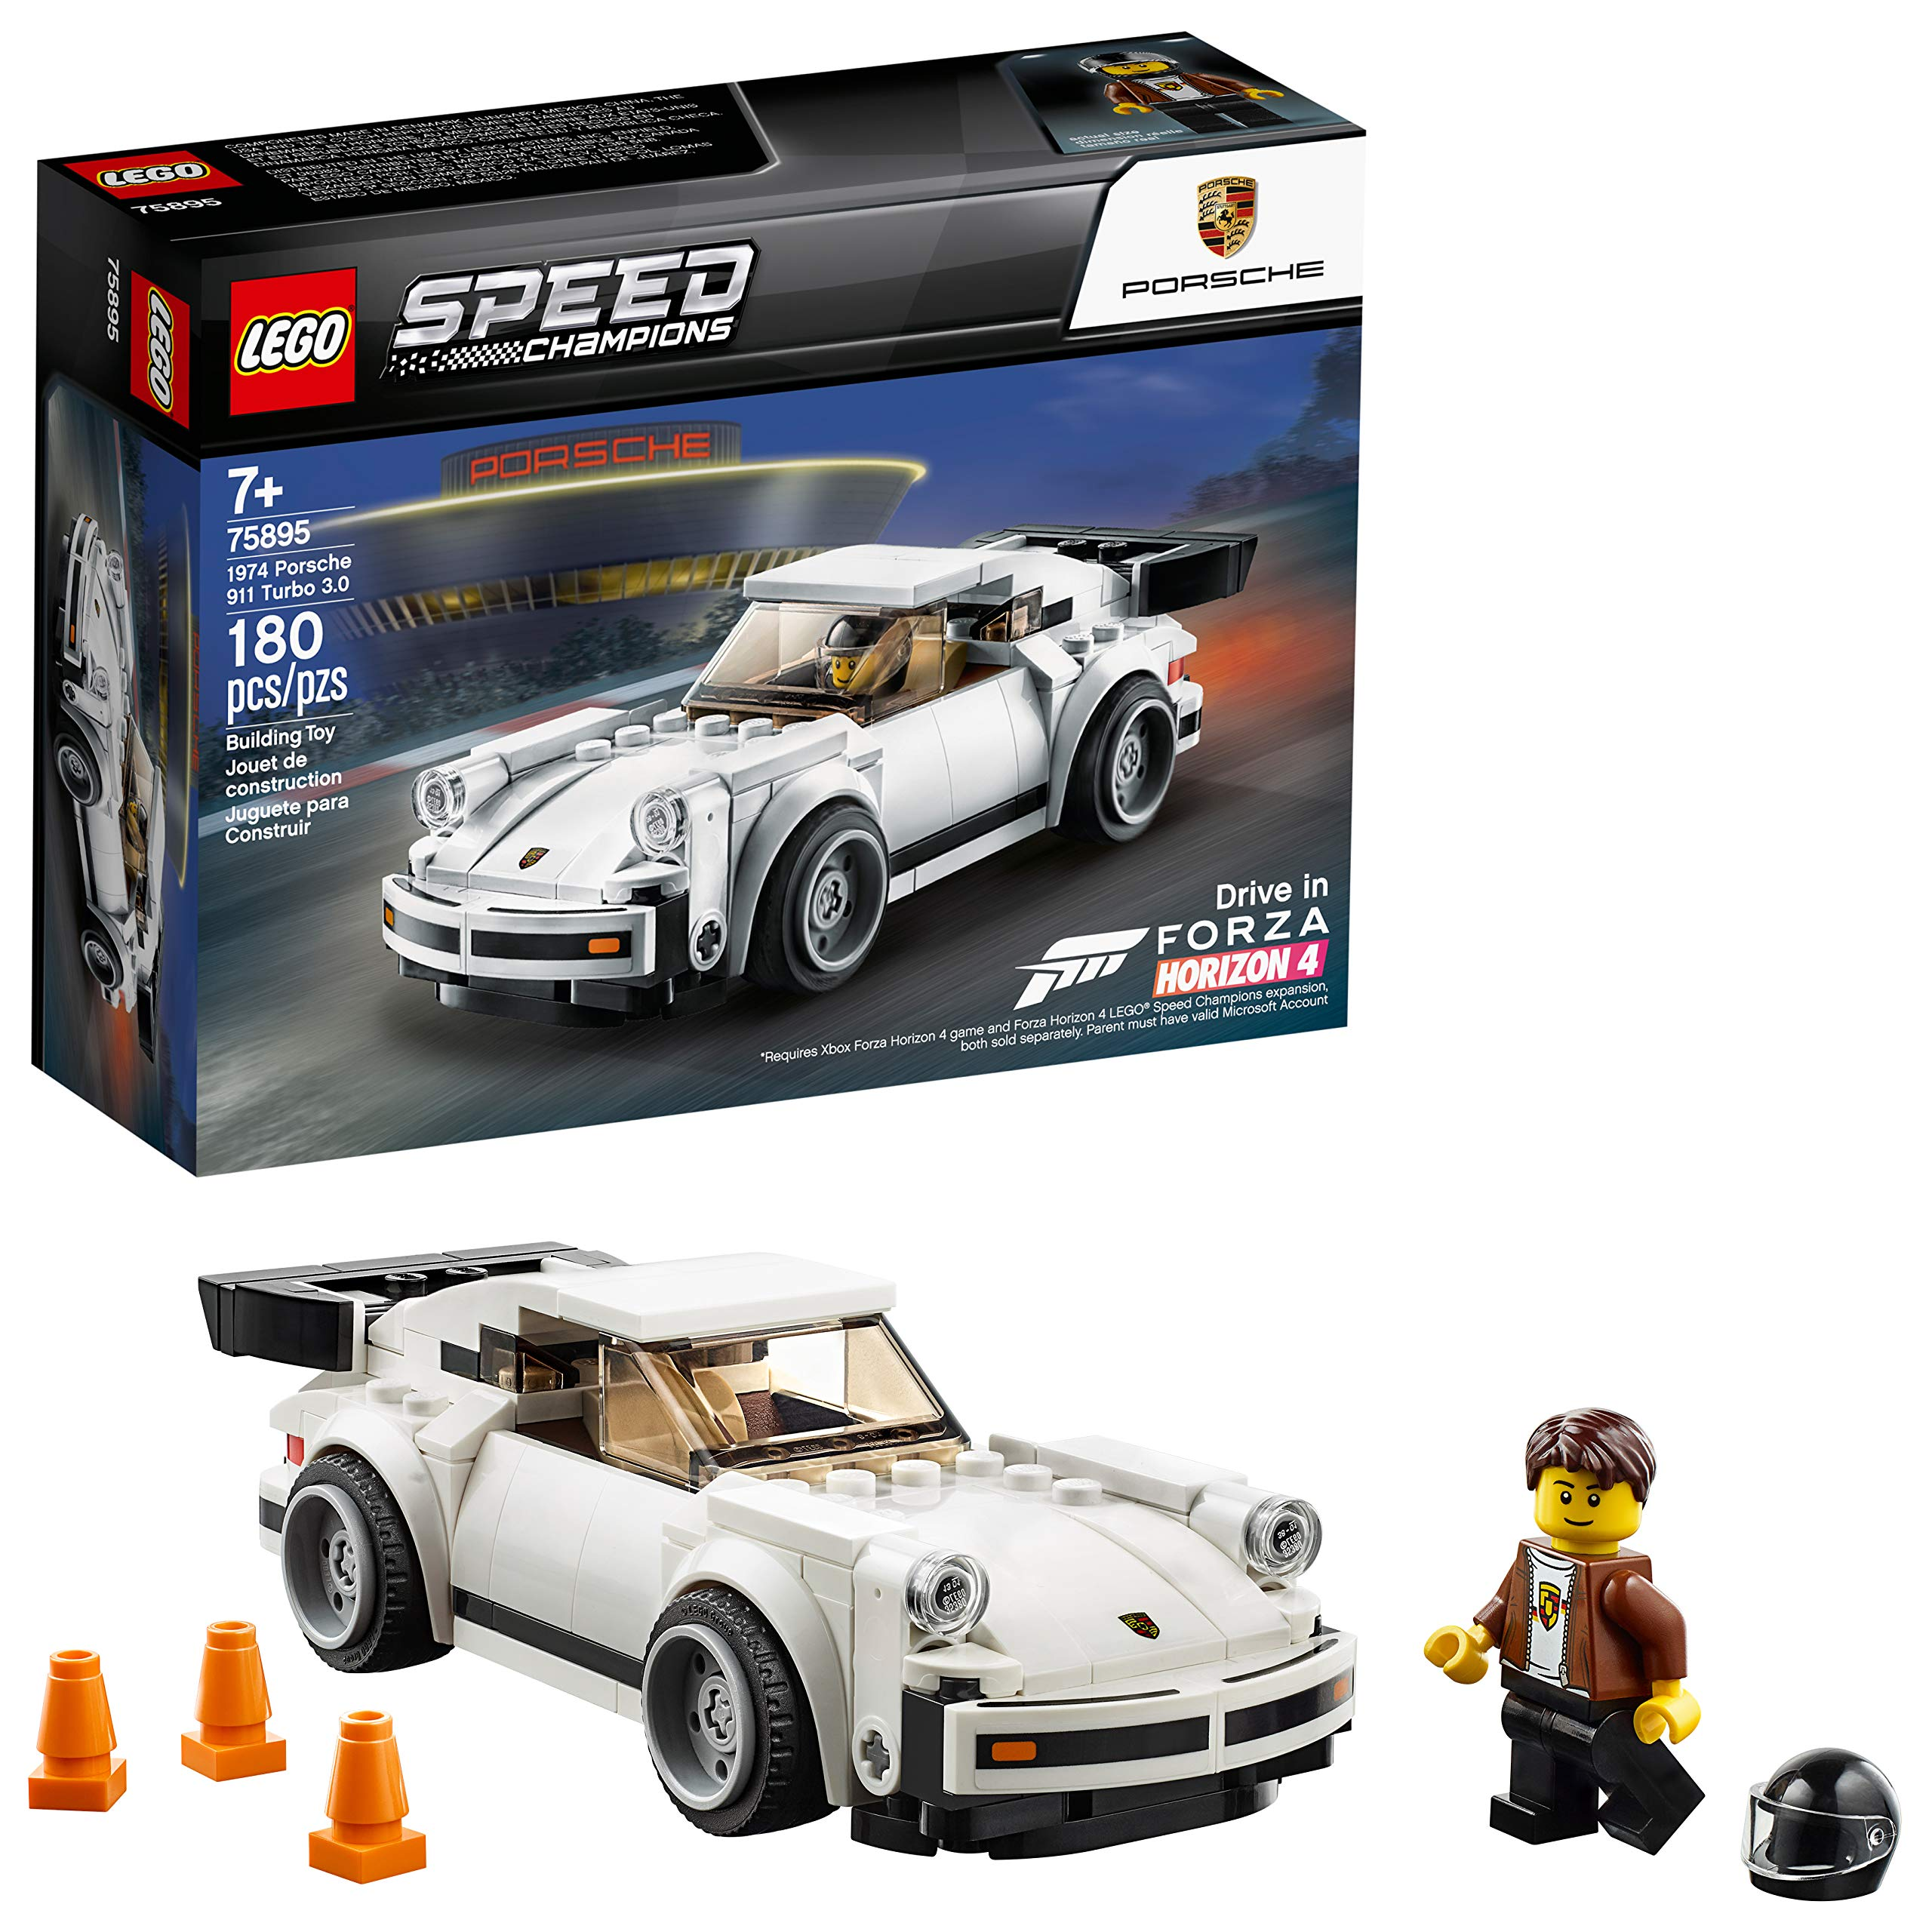 LEGO Speed Champions 1974 Porsche 911 Turbo 3.0 75895 Building Kit (180 Pieces)